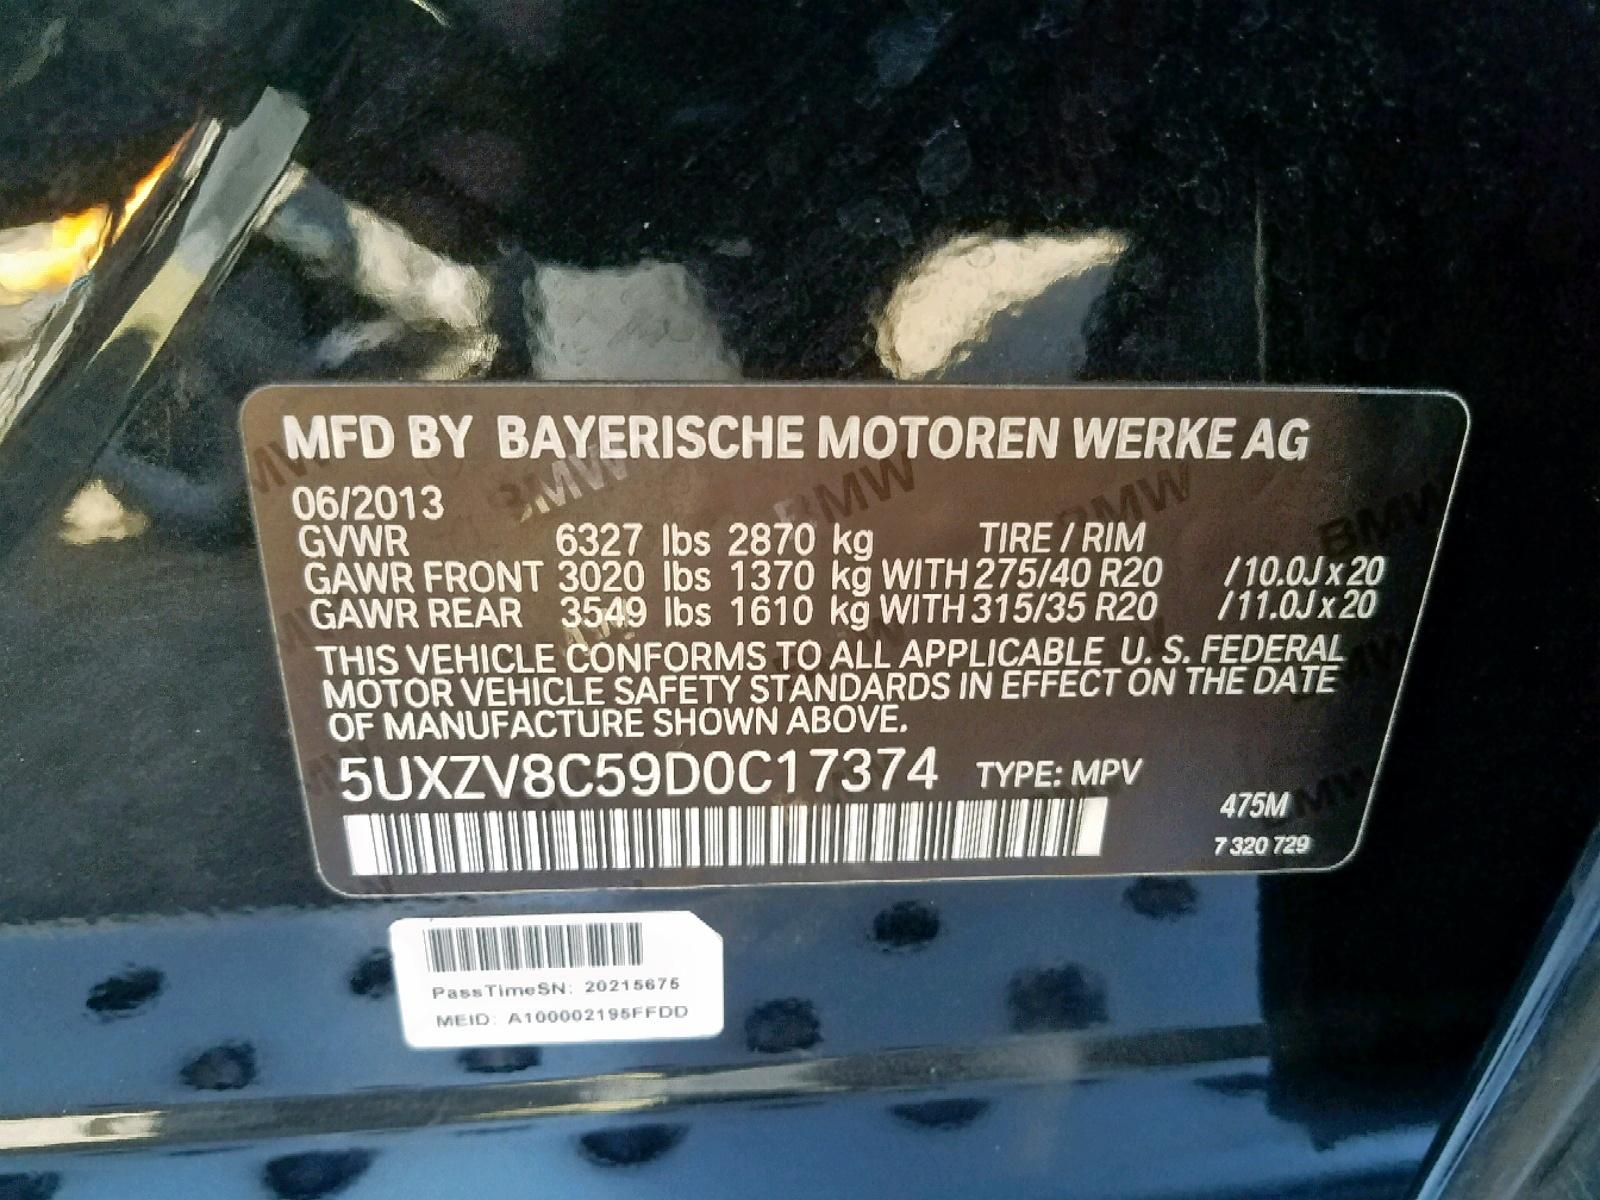 5UXZV8C59D0C17374 - 2013 Bmw X5 Xdrive5 4.4L